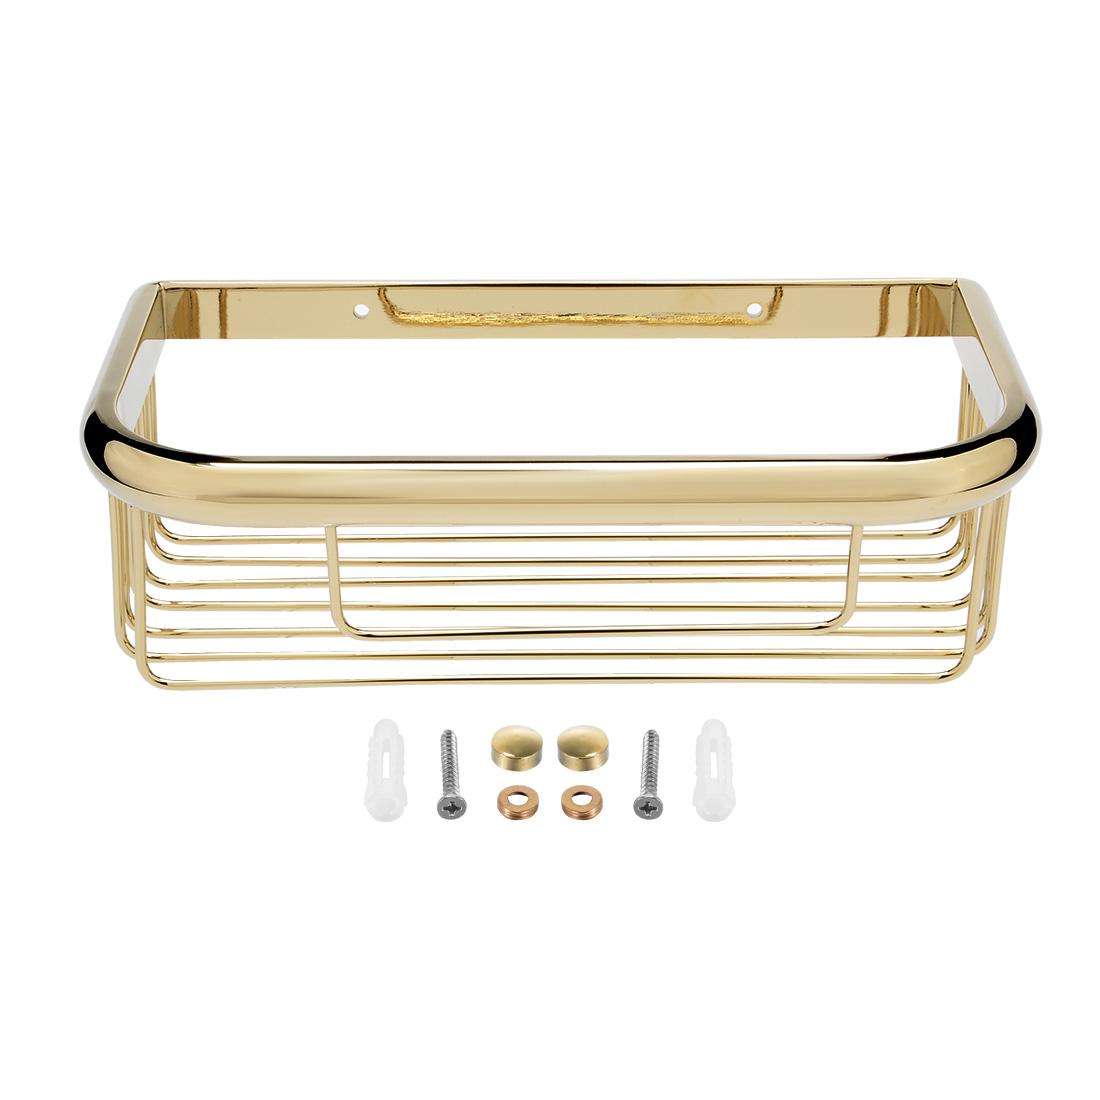 10-inch Brass Wall Mount Rectangle Shape Bathroom Shower Caddy Basket Gold Tone